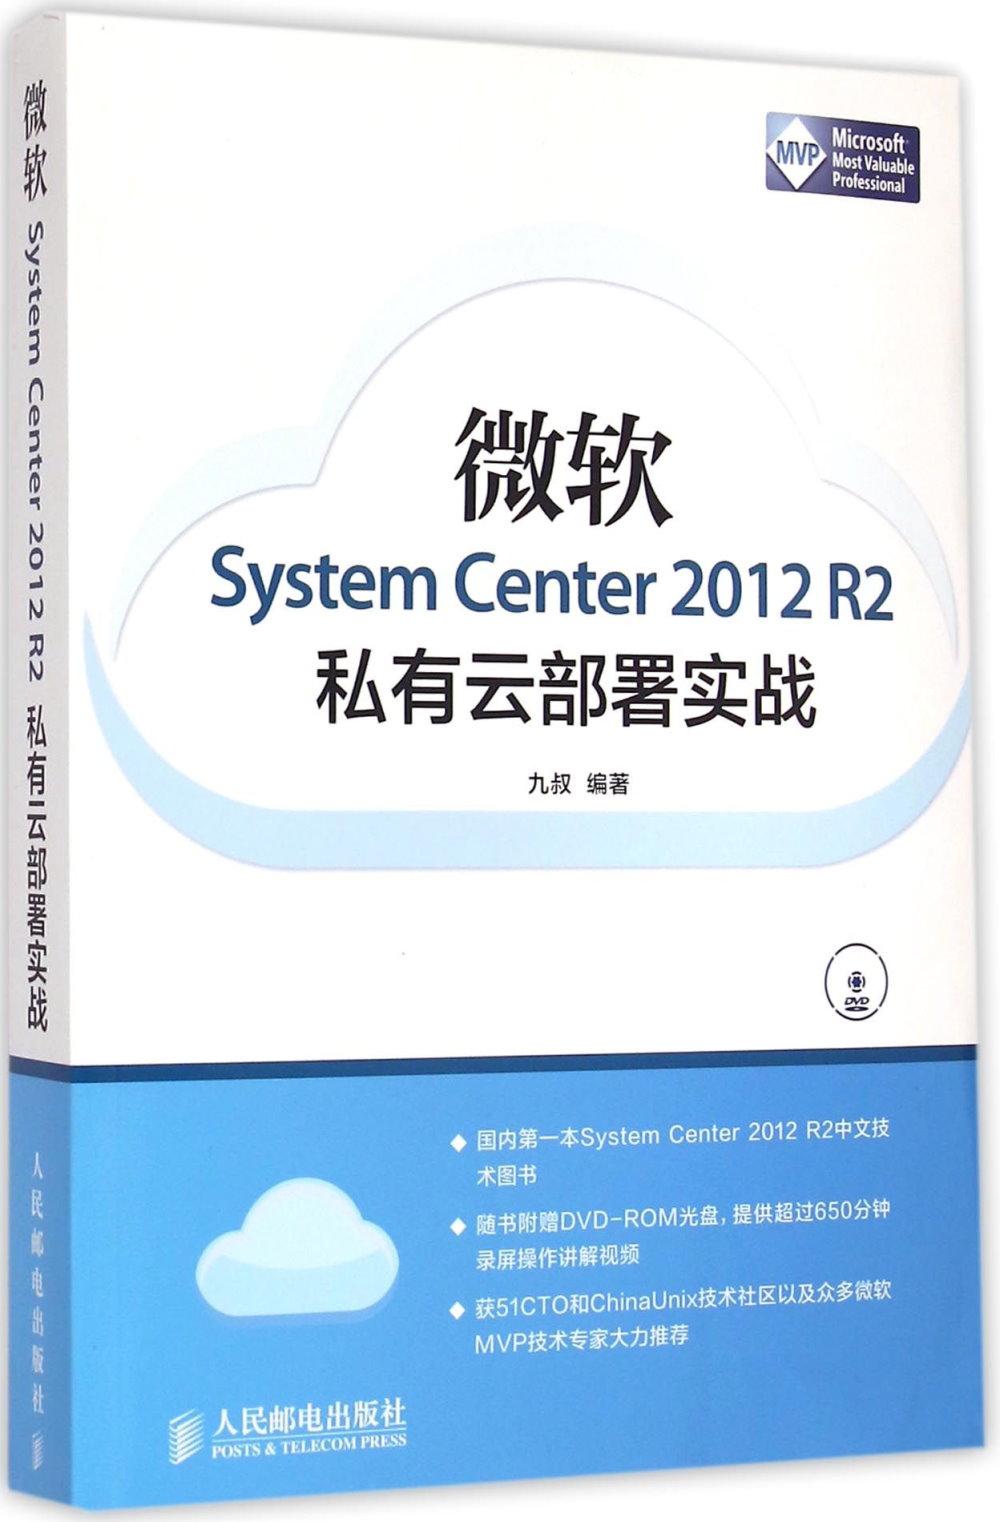 微軟System Center 2012 R2私有雲部署實戰